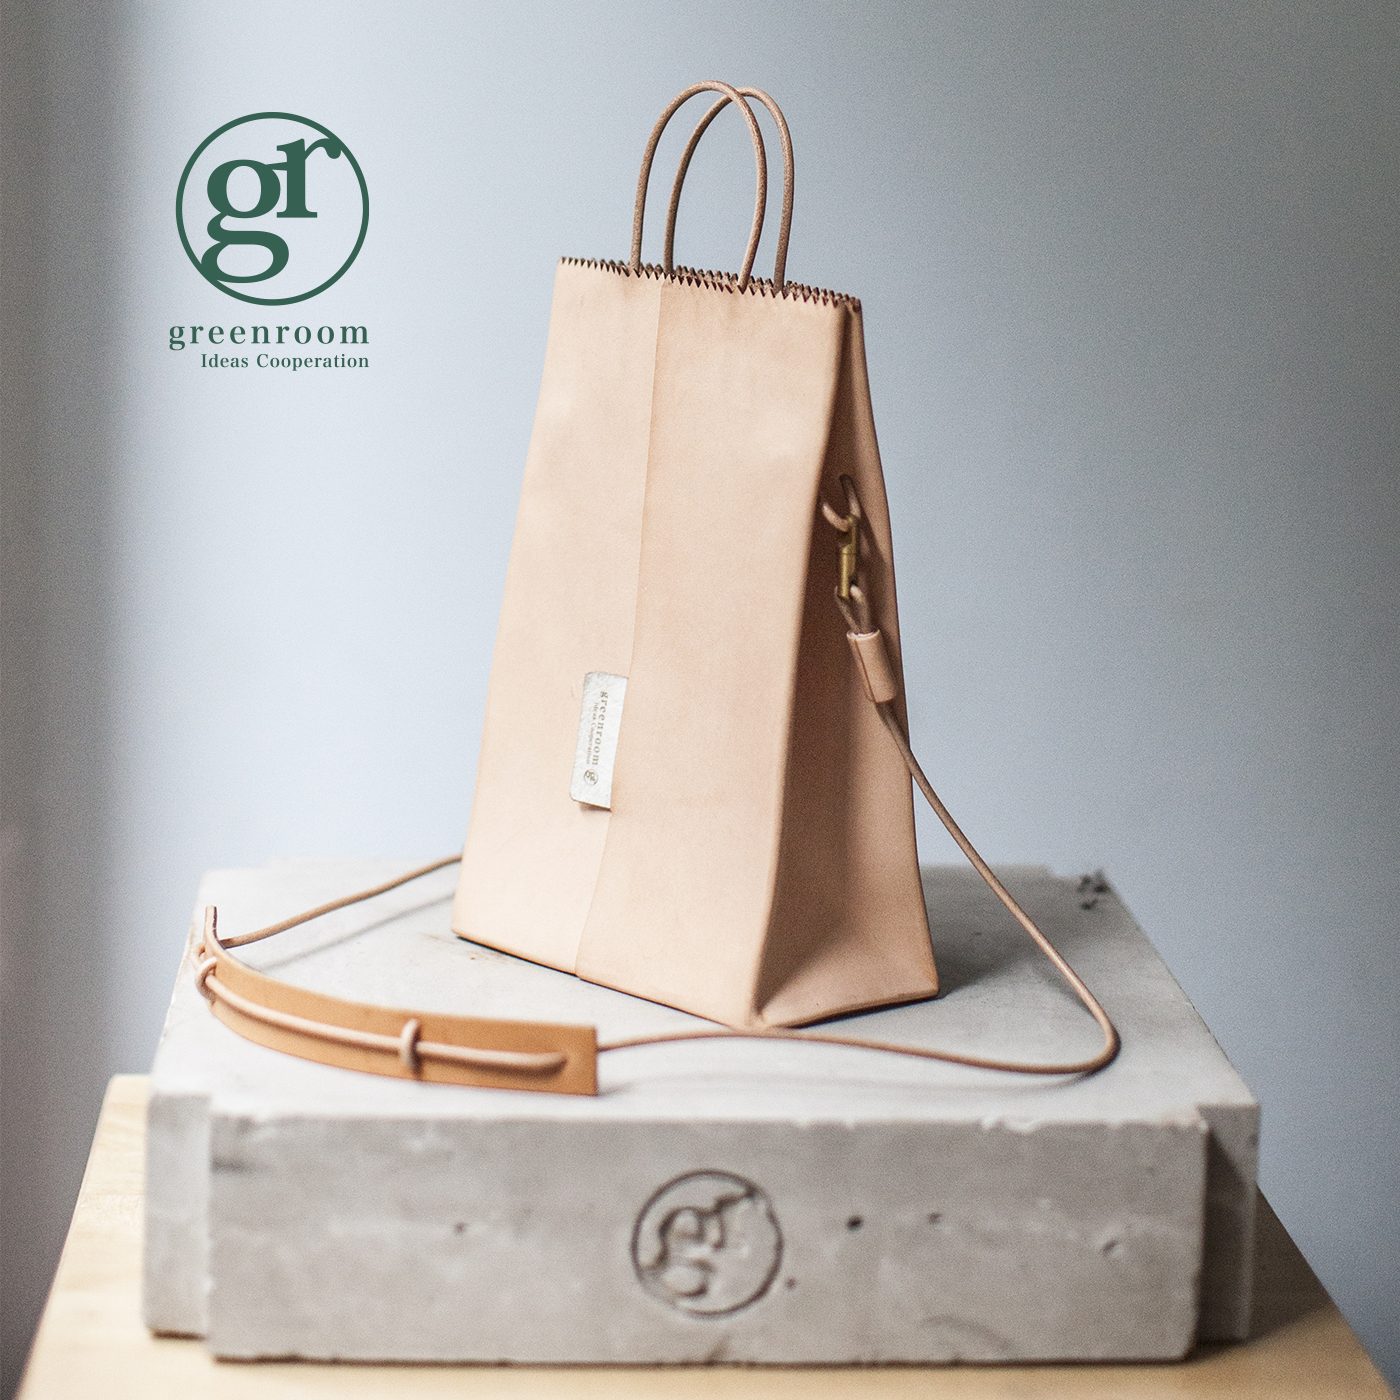 greenroom,greenroom 手工皮革製研所,手工皮革,皮革,皮製品,皮包,皮革後背包,皮革包包,手工皮件,台灣手工皮件